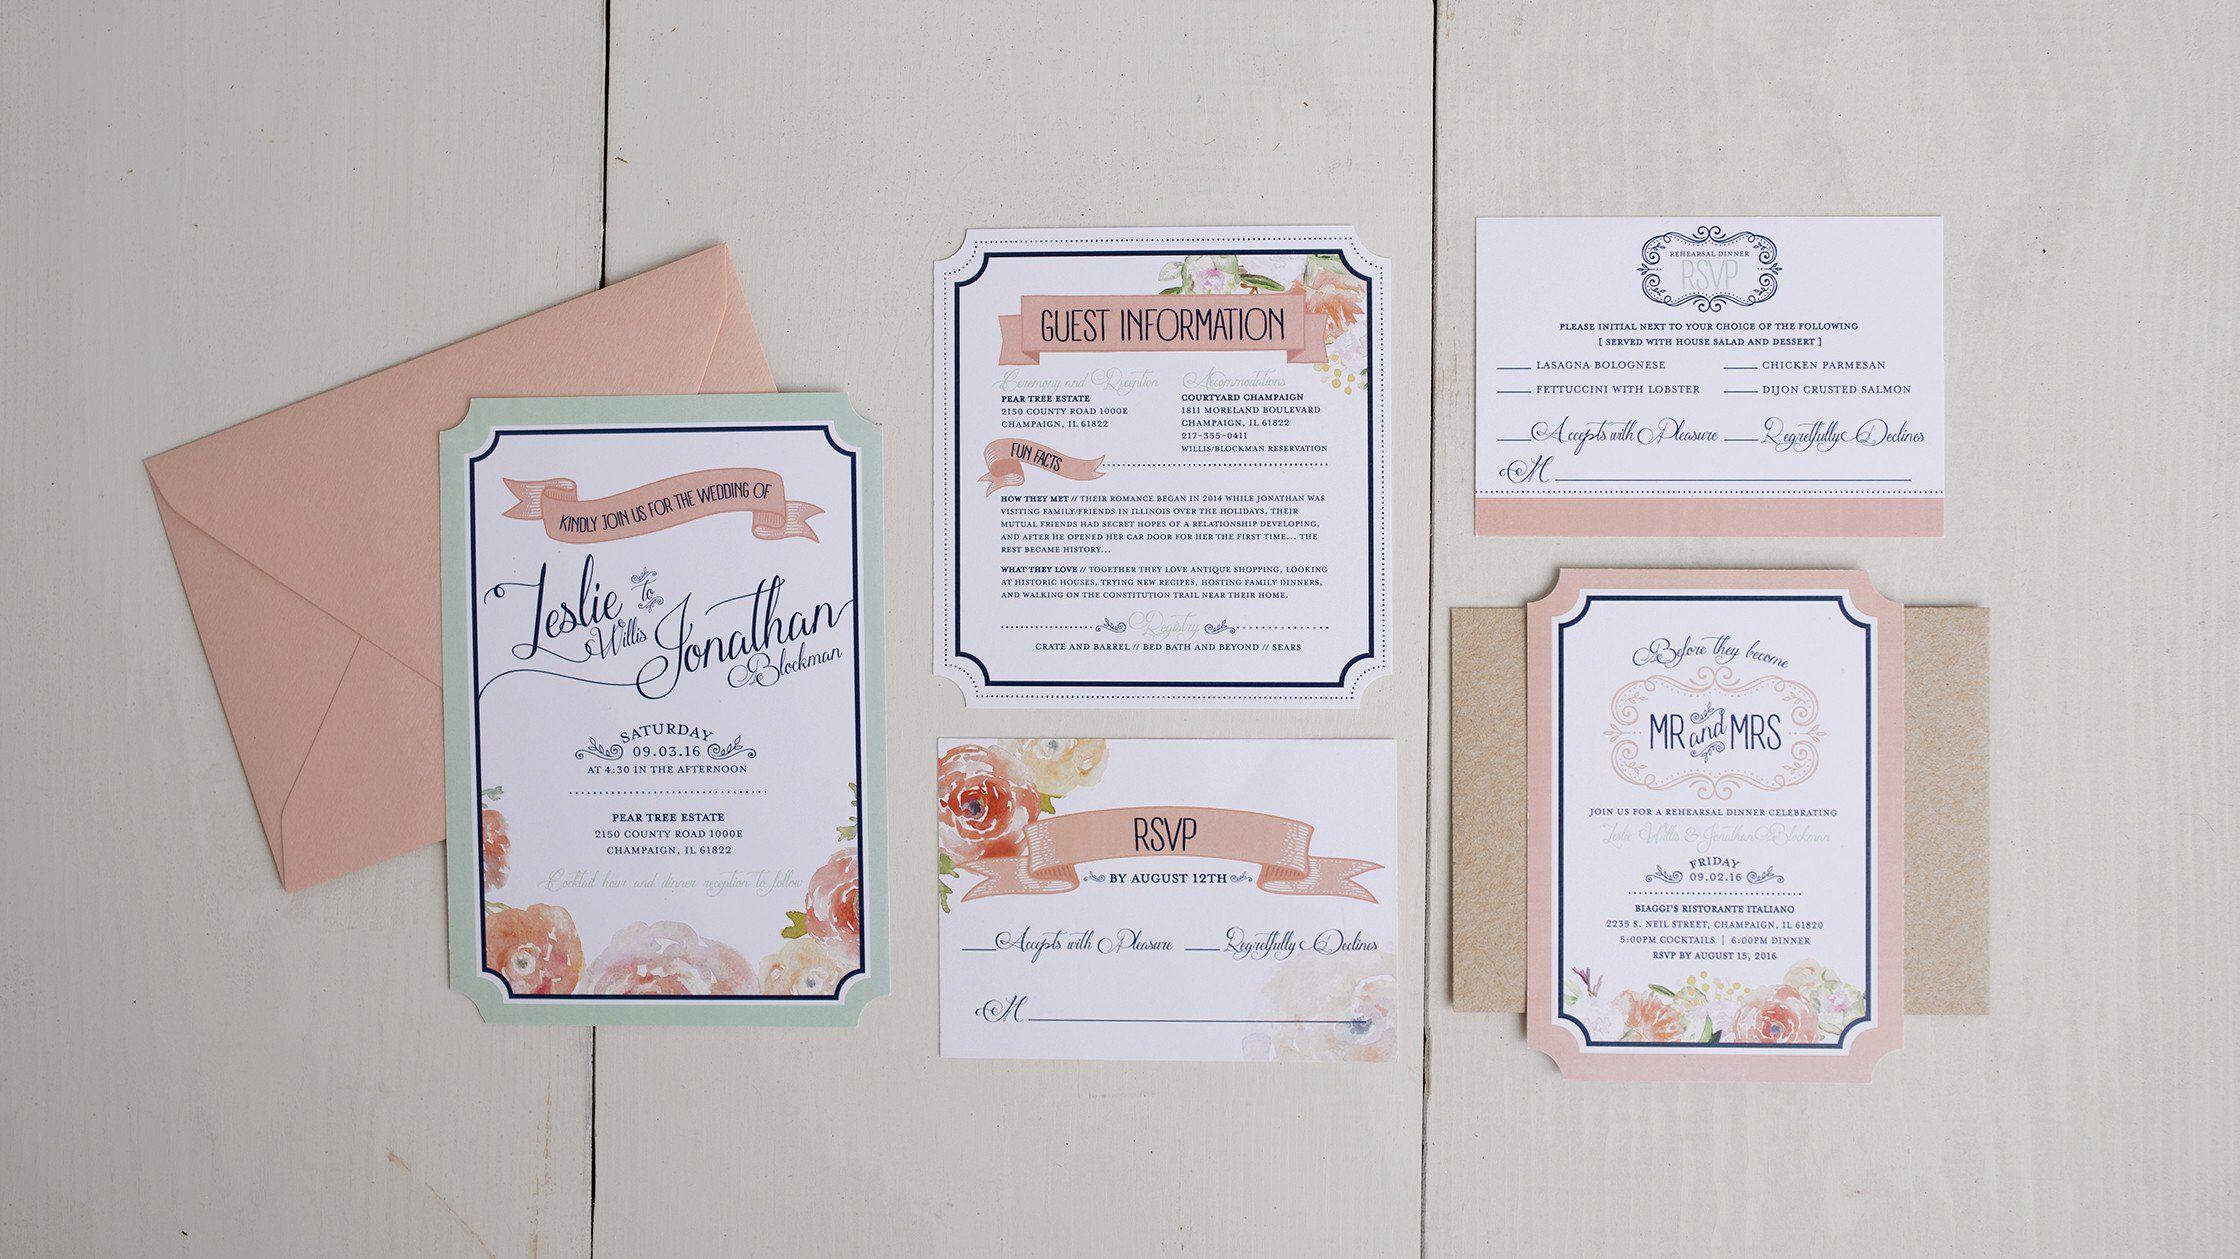 Bed Bath And Beyond Invitations Elegant Wedding Invitation Design Kelly Invitation Printing Elegant Wedding Invitation Design Wedding Invitation Card Design